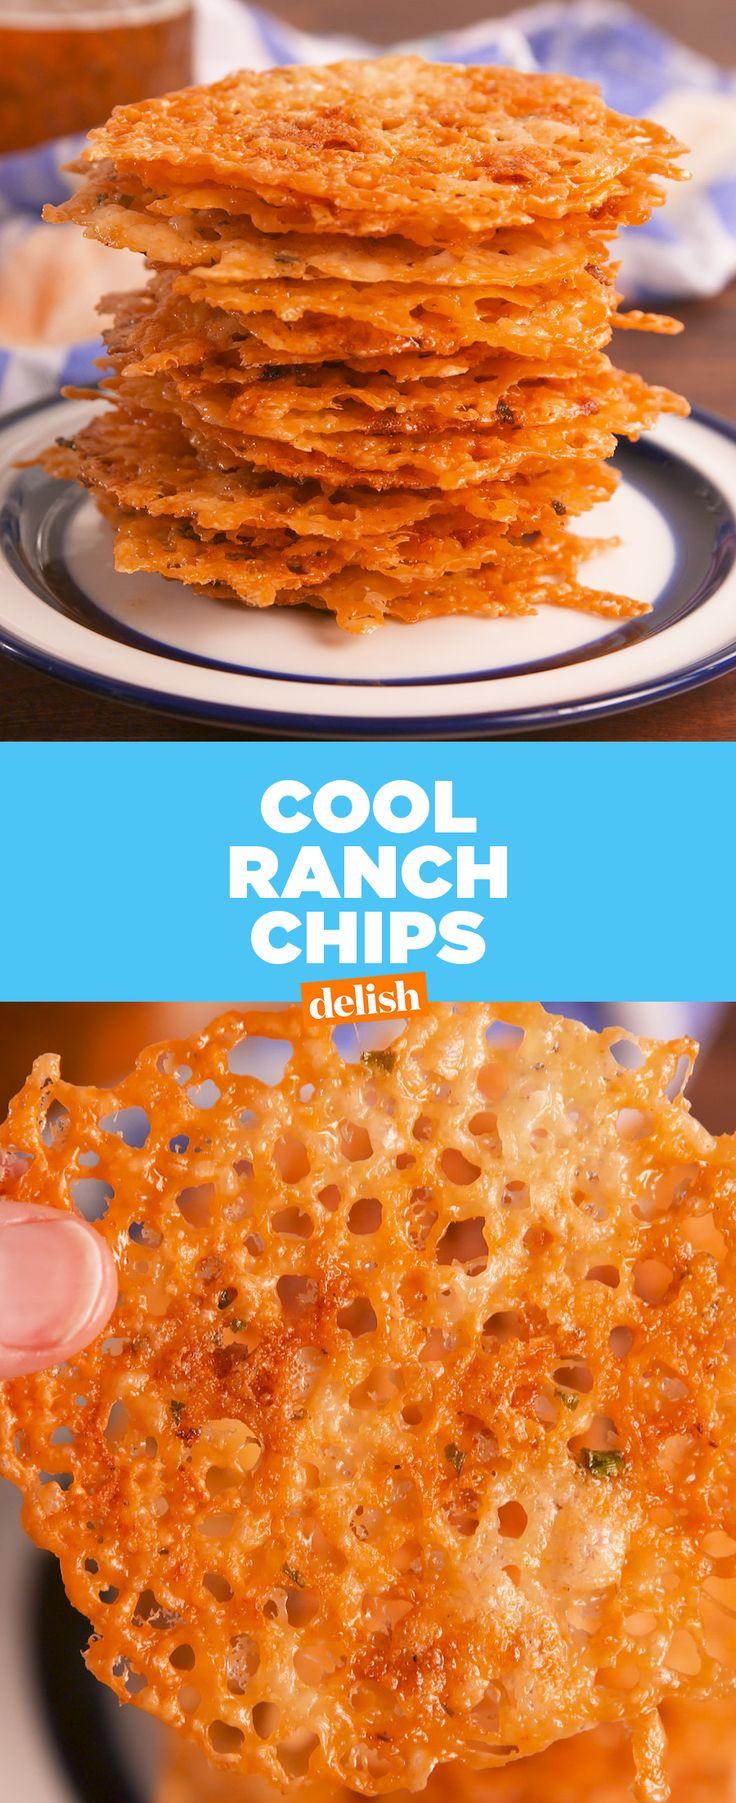 PSA: Low-carb Doritos exist!! Get the recipe at Delish.com. #recipe #easyrecipe #chips #cheese #ranch #cheddar #doritos #snack #snacking #lowcarb #lowcarbdiet #lowcarbrecipes #garlic